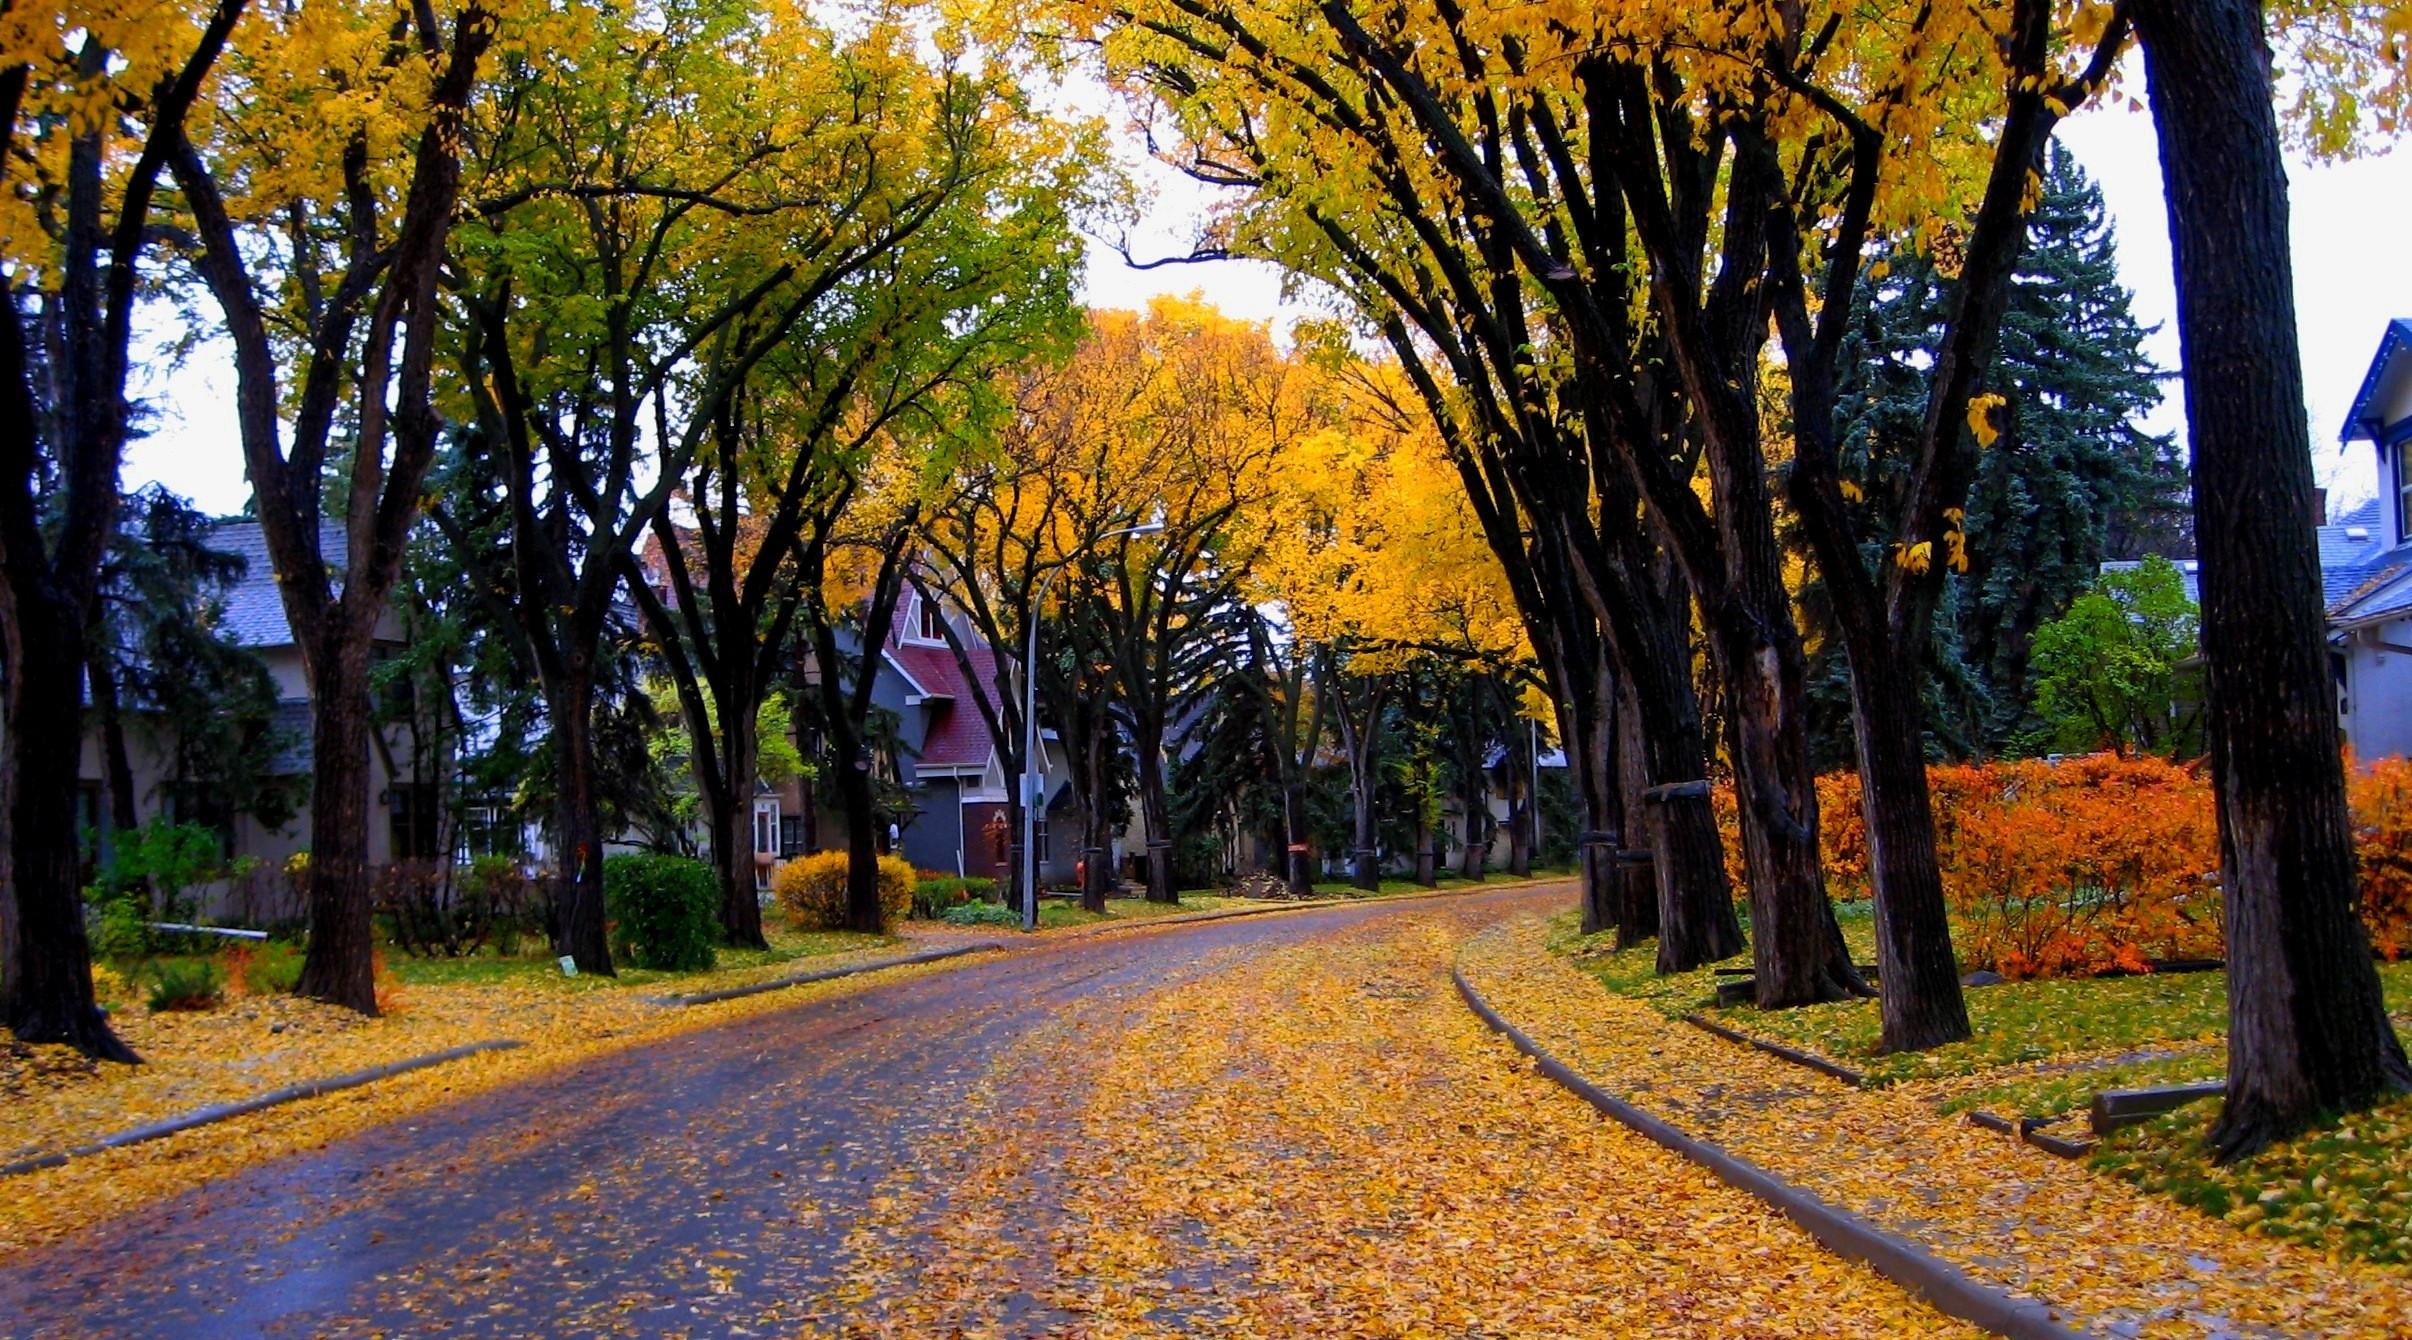 Portland Oregon Fall Had Wallpaper Street In Autumn Hd Wallpaper Background Image